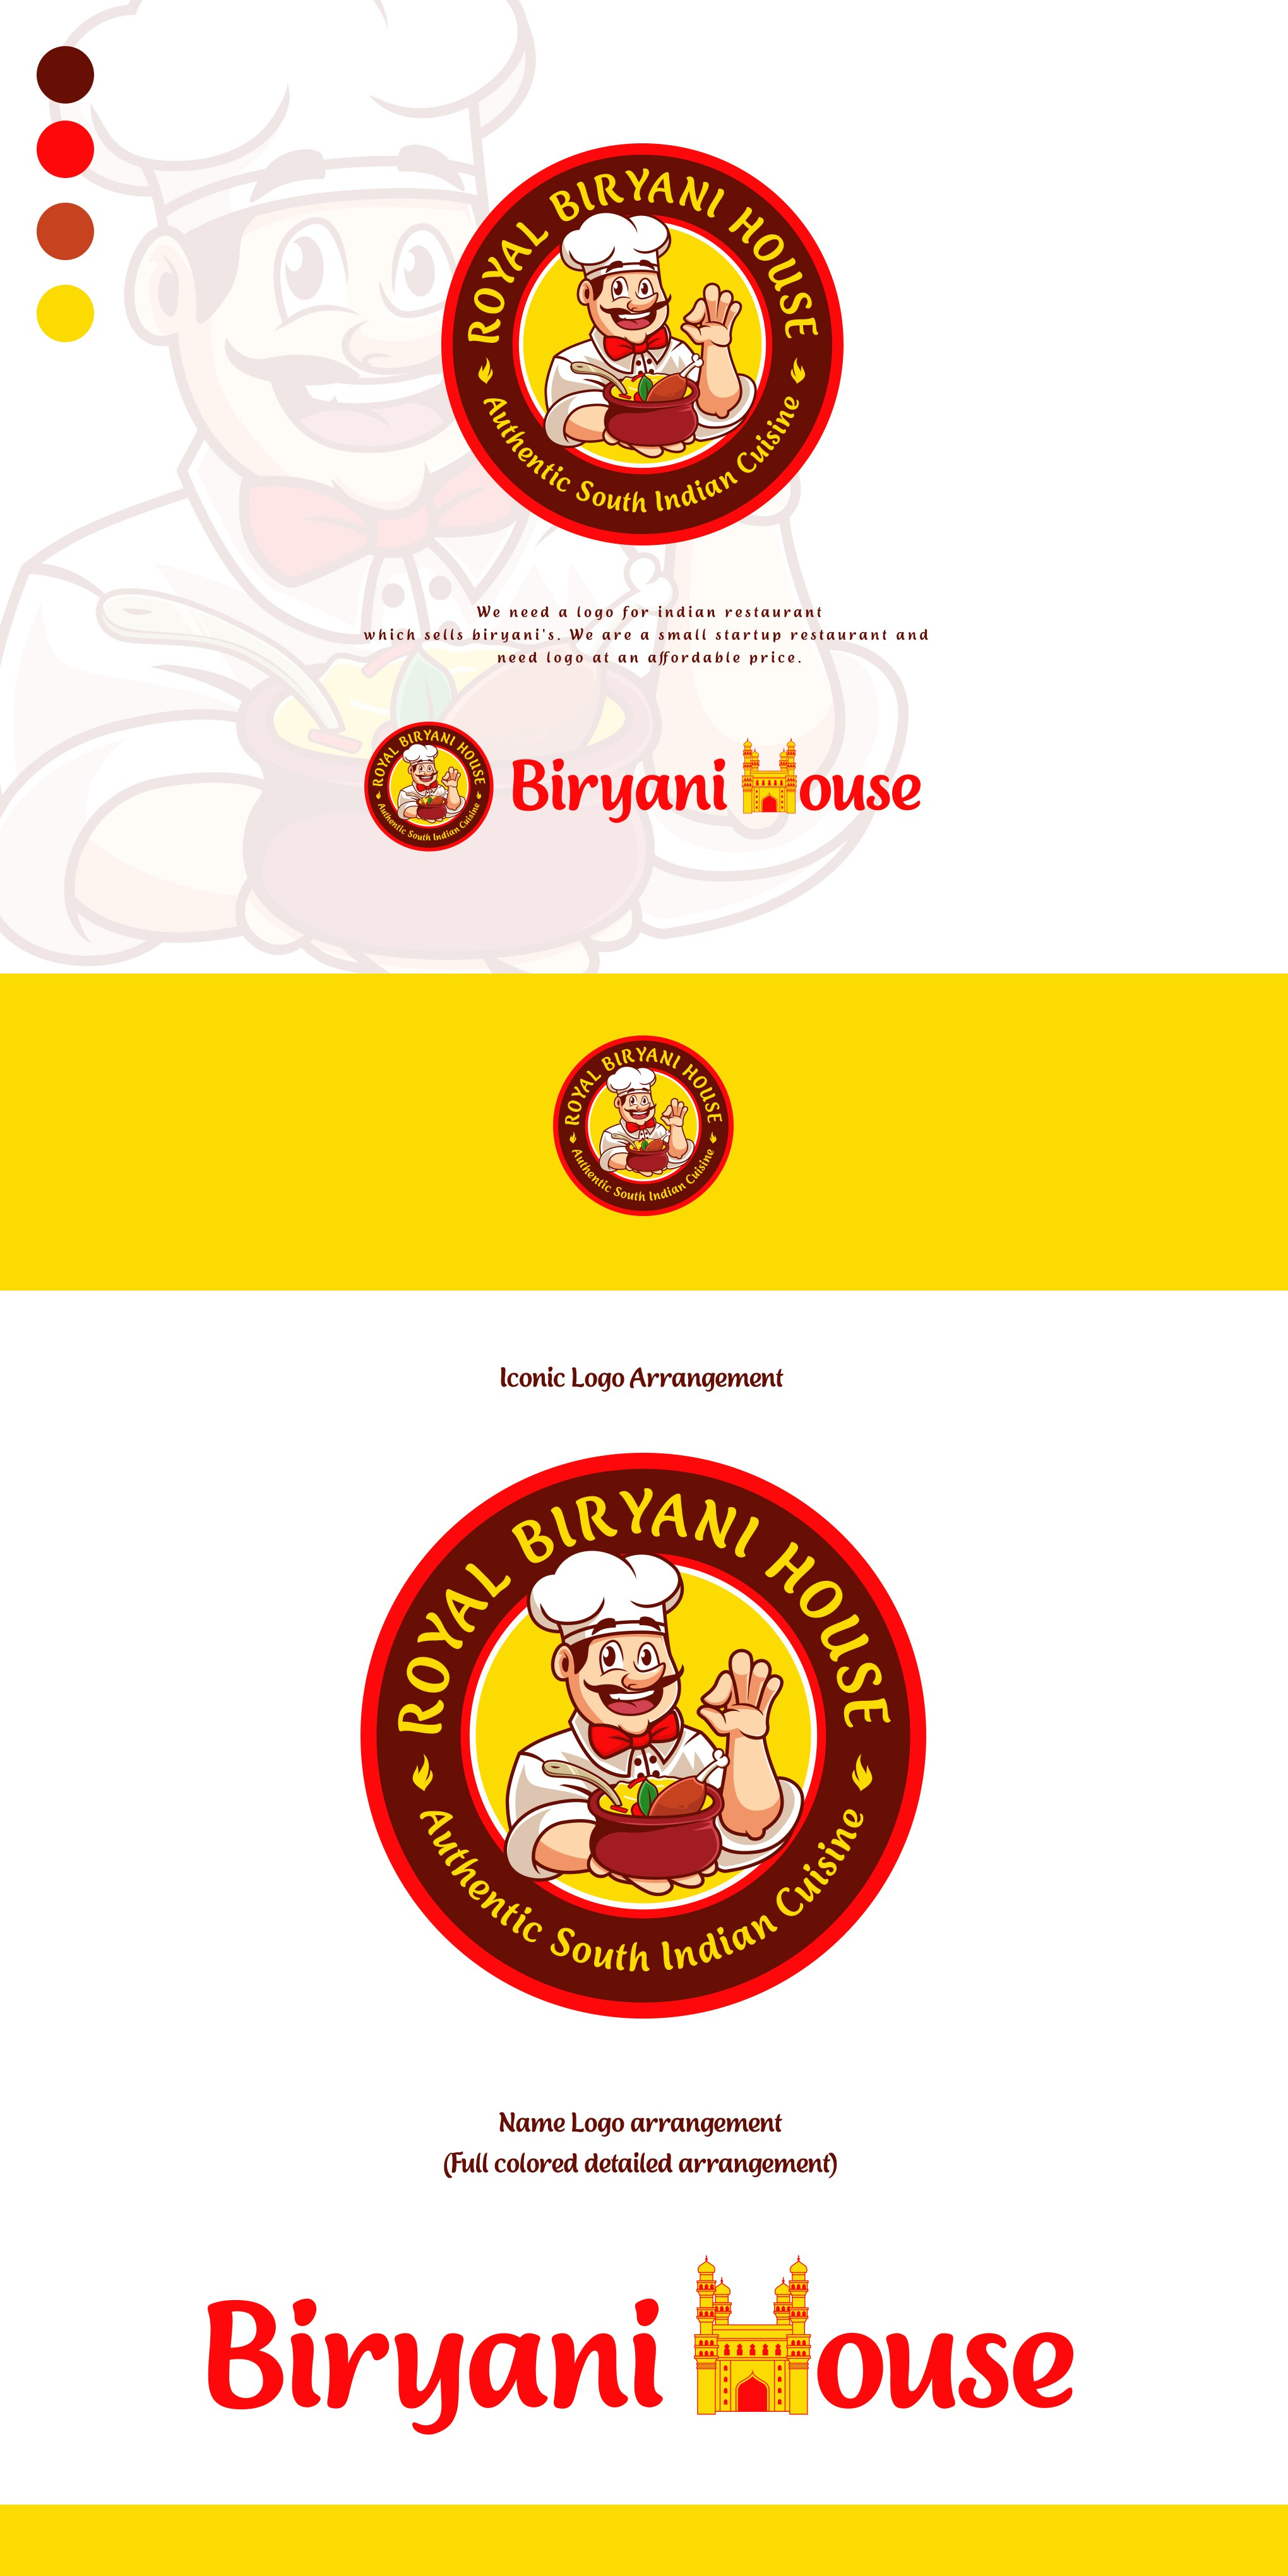 logo design for an indian restaurant